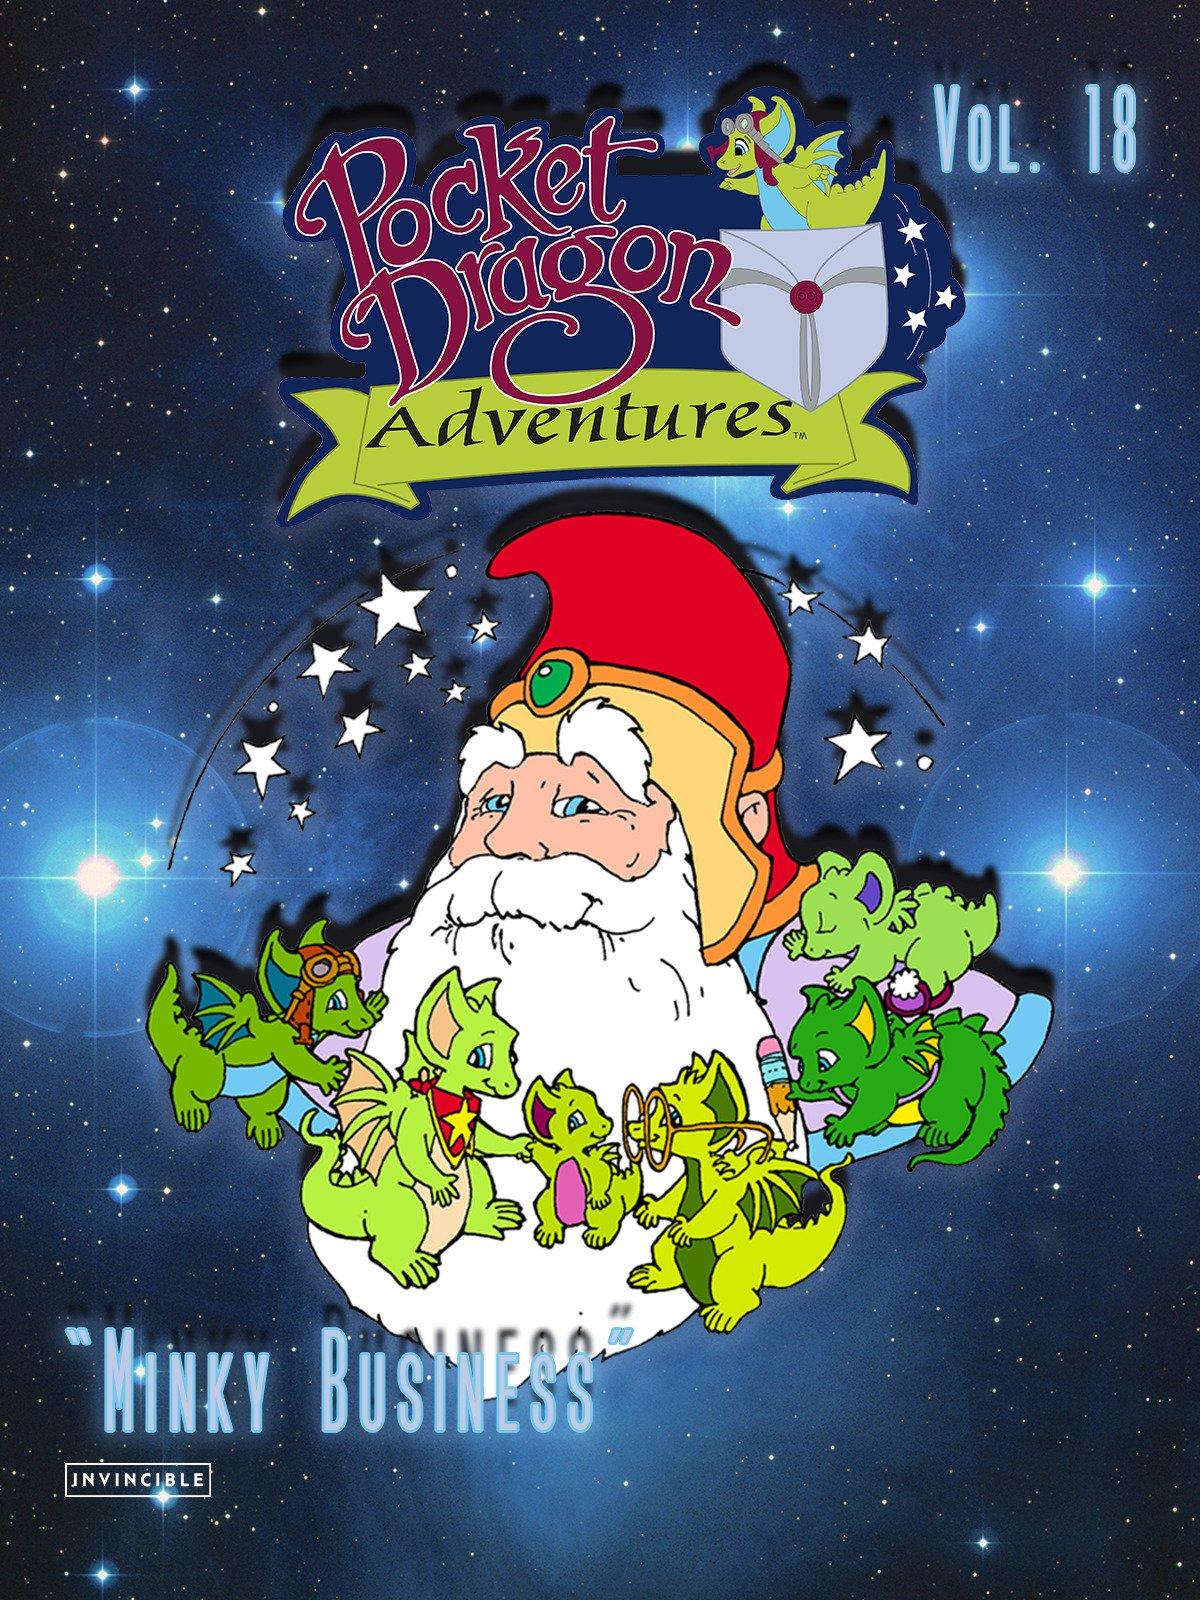 Pocket Dragon Adventures Vol. 18Minky Business